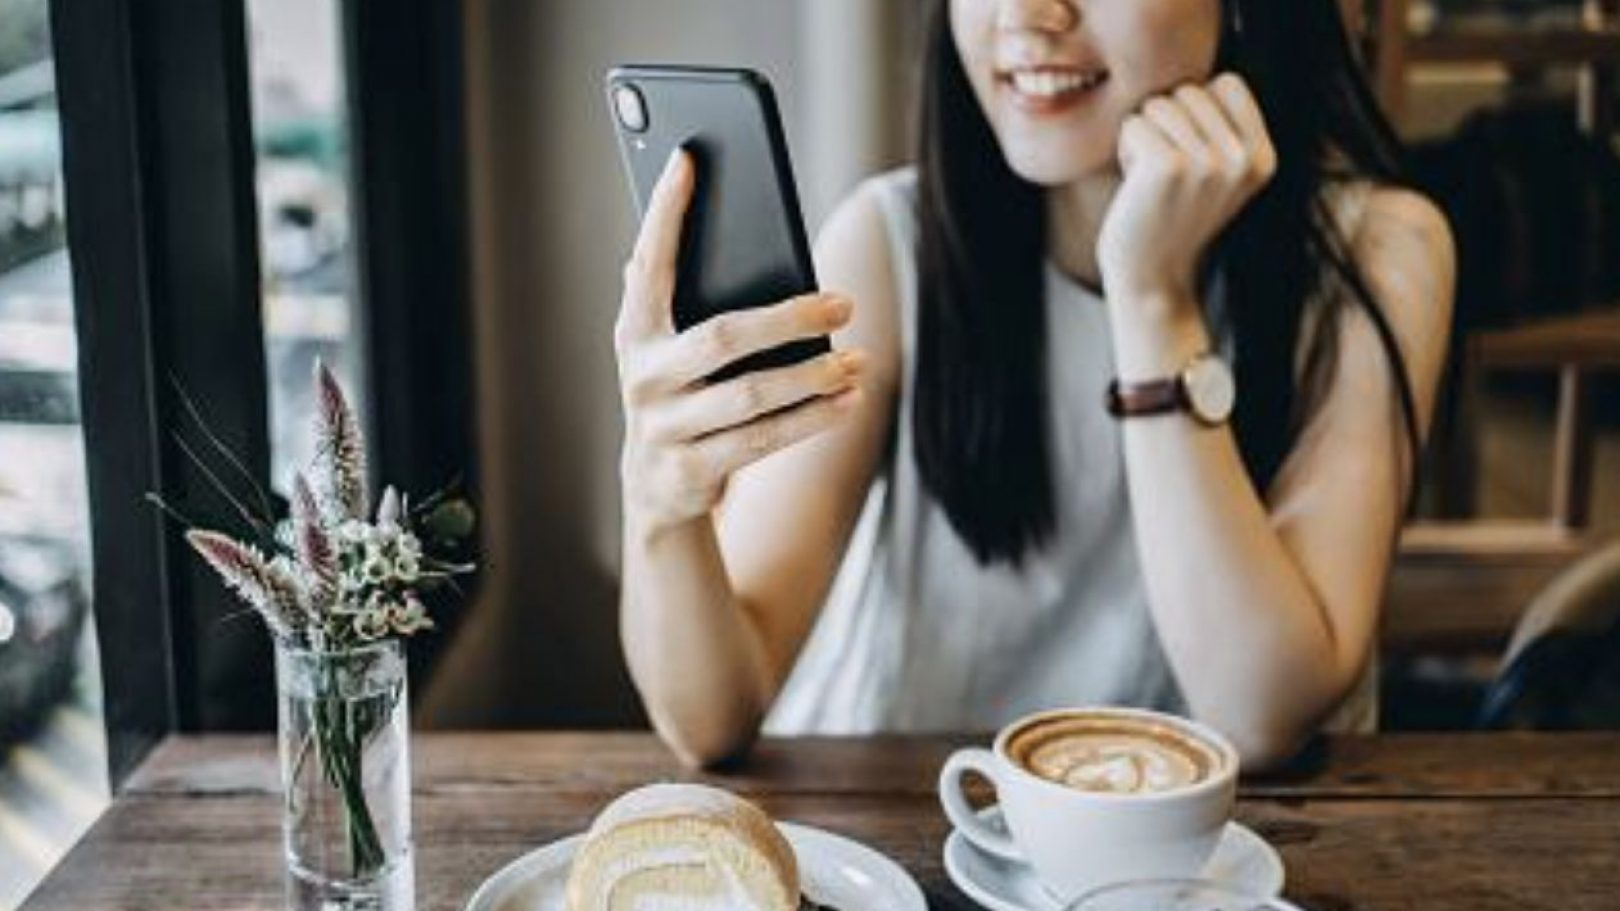 dating app secrets